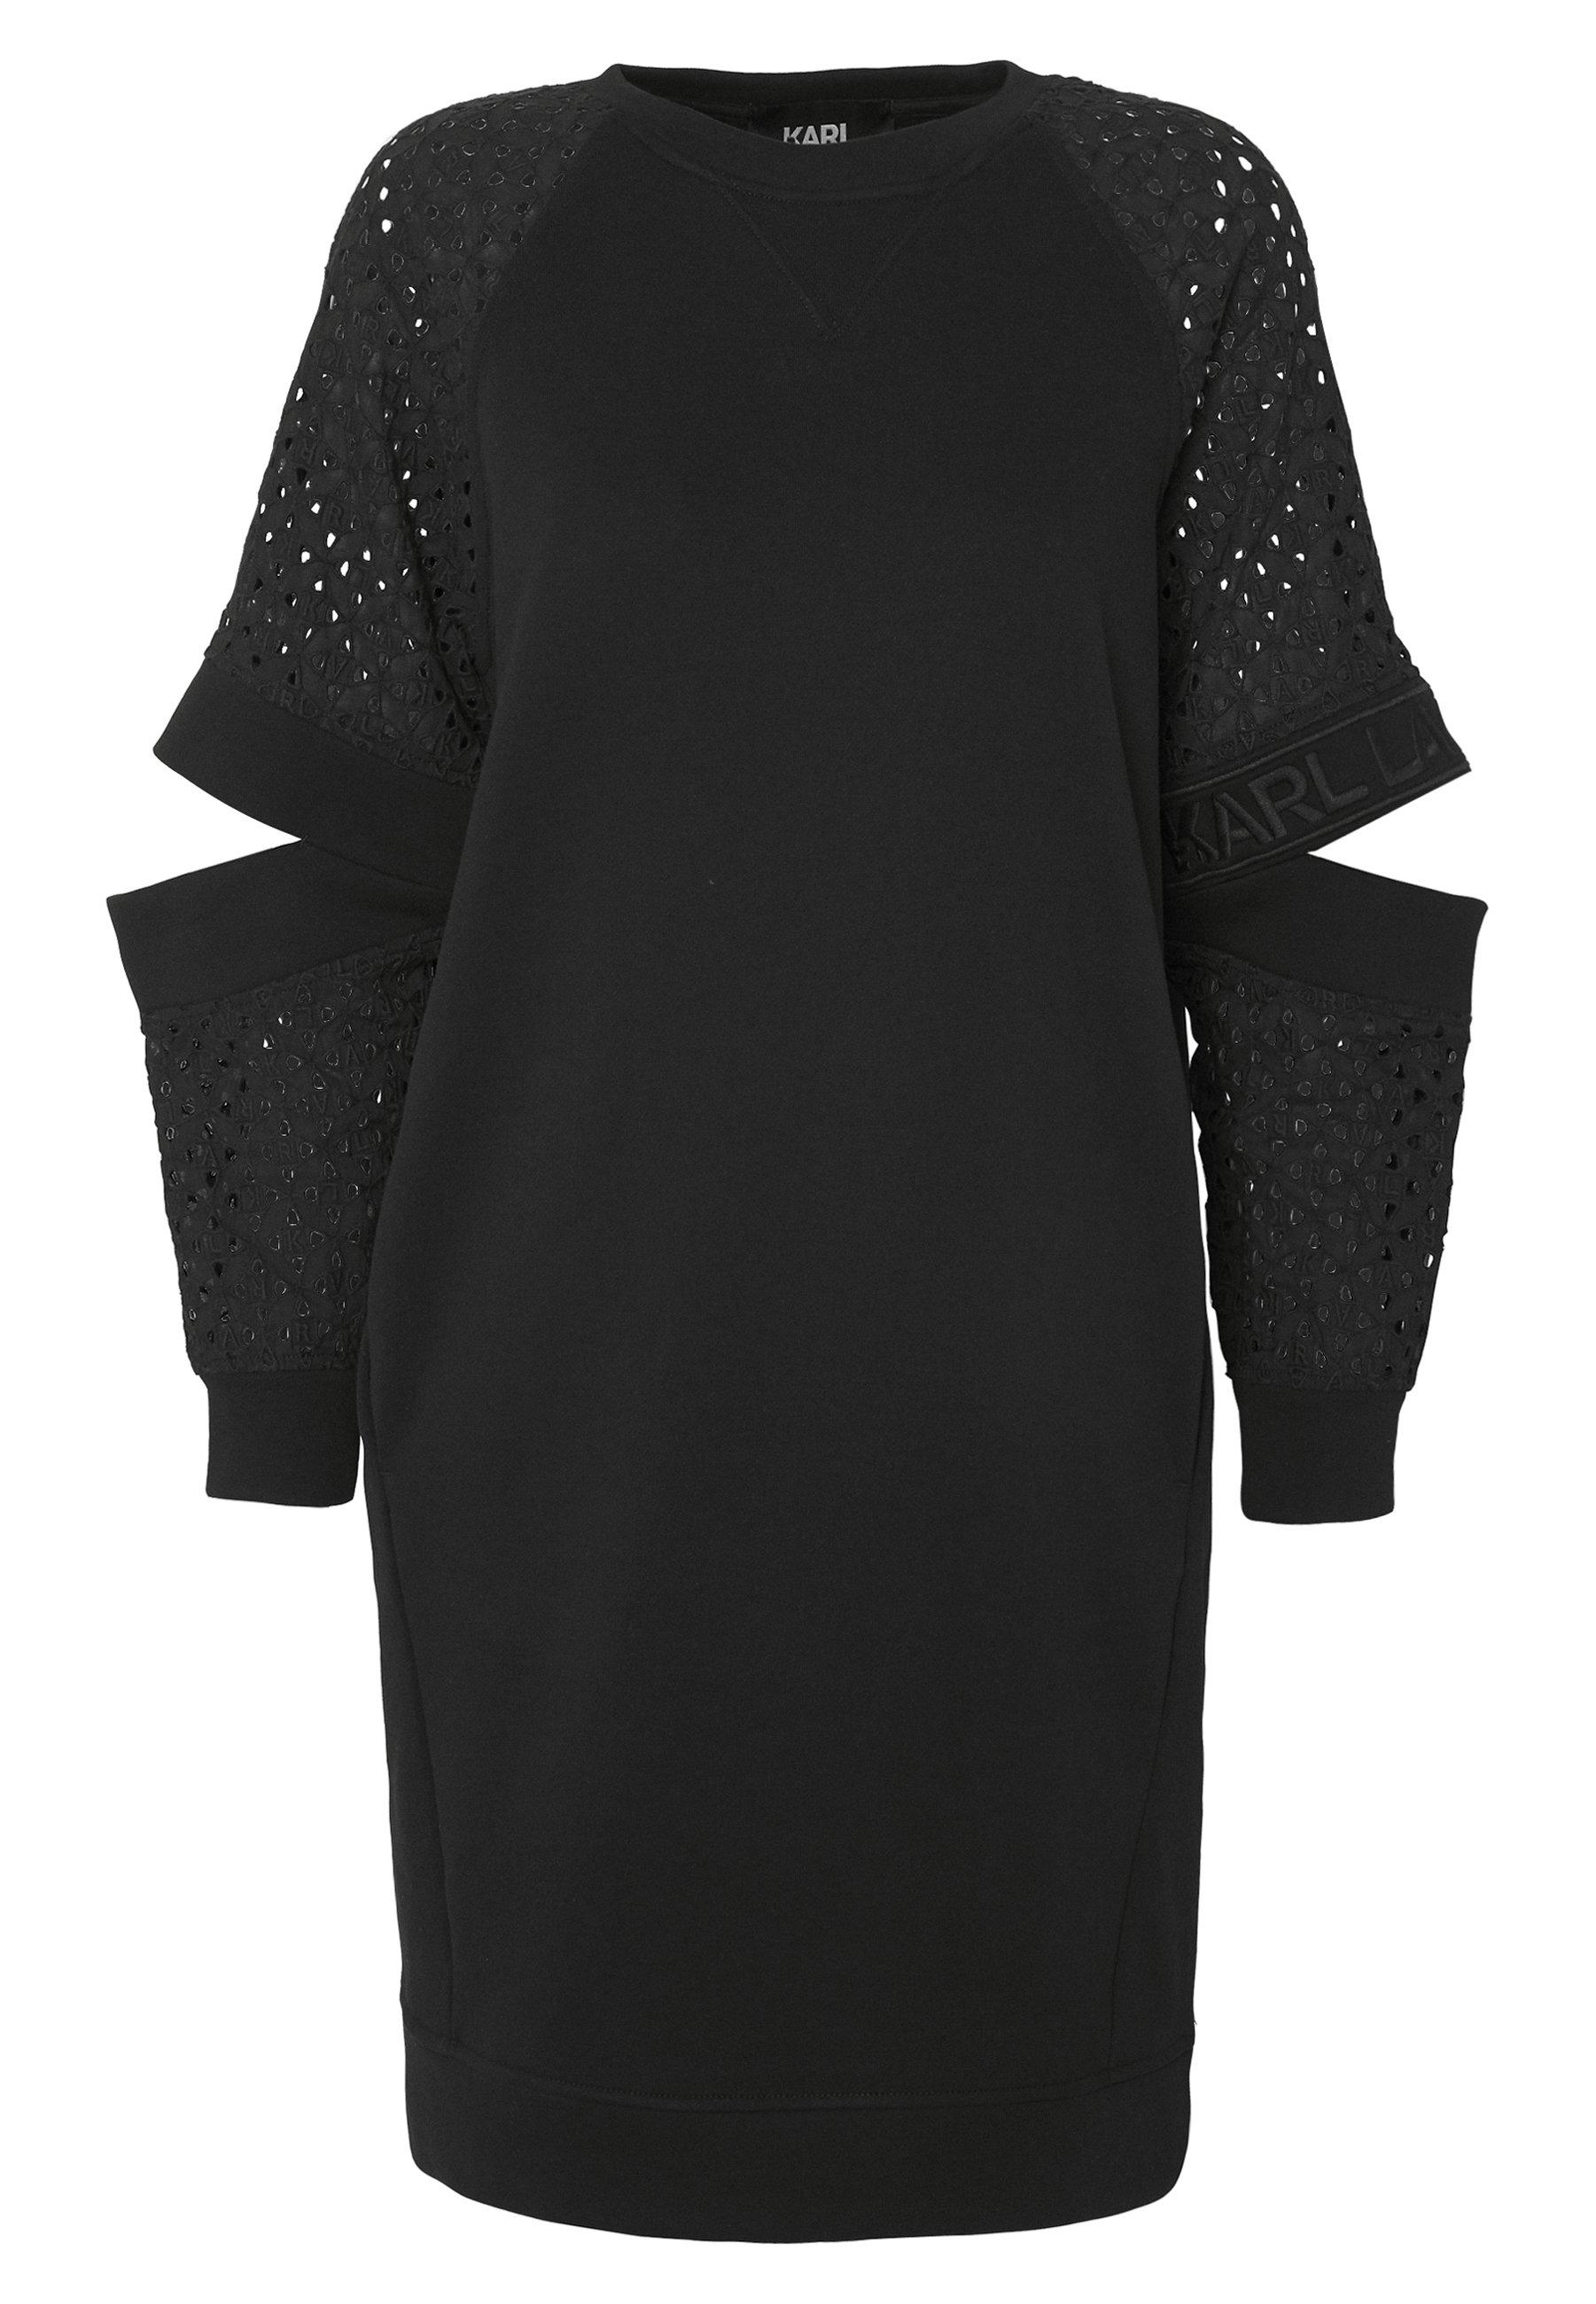 Karl Lagerfeld Sweatshirts: Shoppe bis zu −62% | Stylight